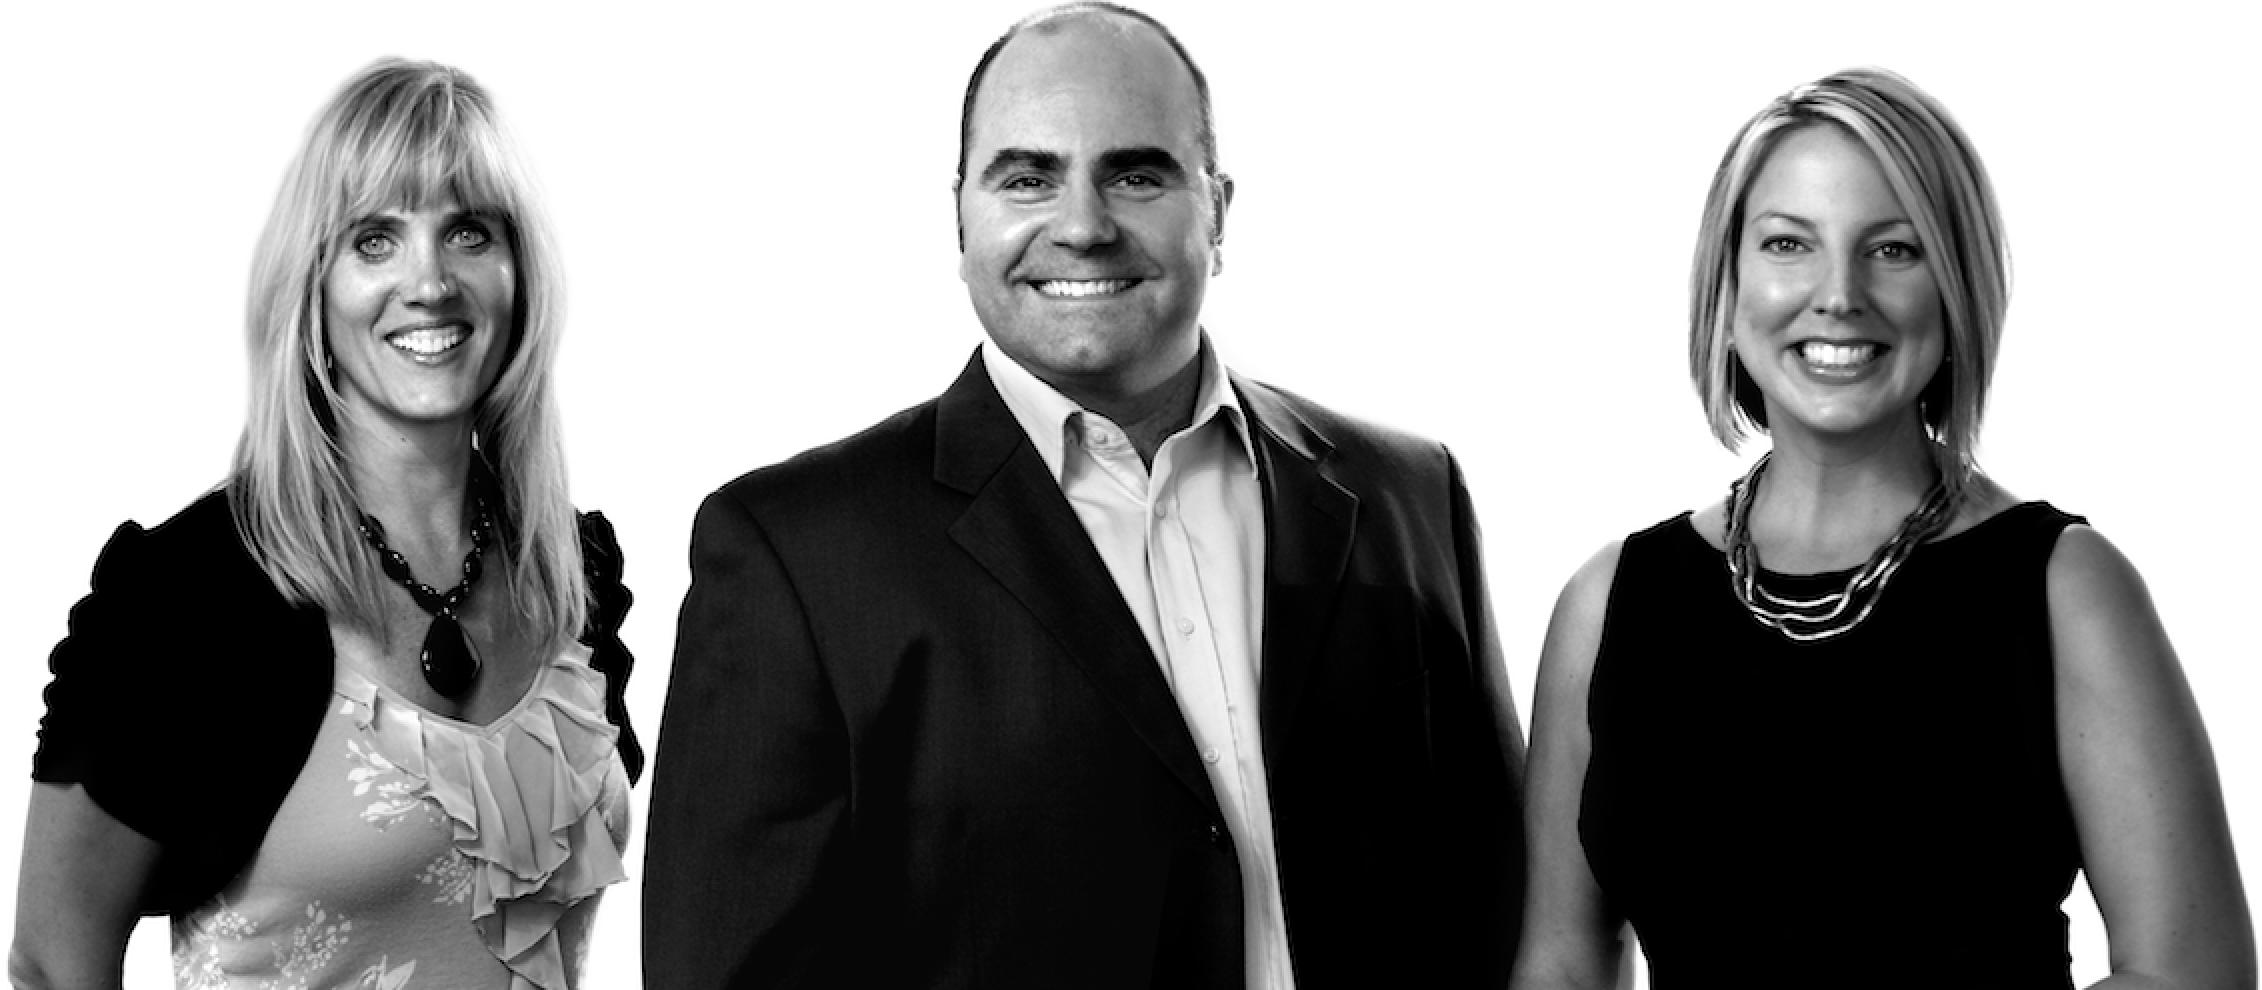 - (Left) Jody Kolars: Marketing Lead, Designer, Serial Entrepreneur(Center) John Nielson: Sales Lead, Strategic Marketing Guru(Right) Elissa Gjertson: Training Lead, Copywriter, Personal Development Author